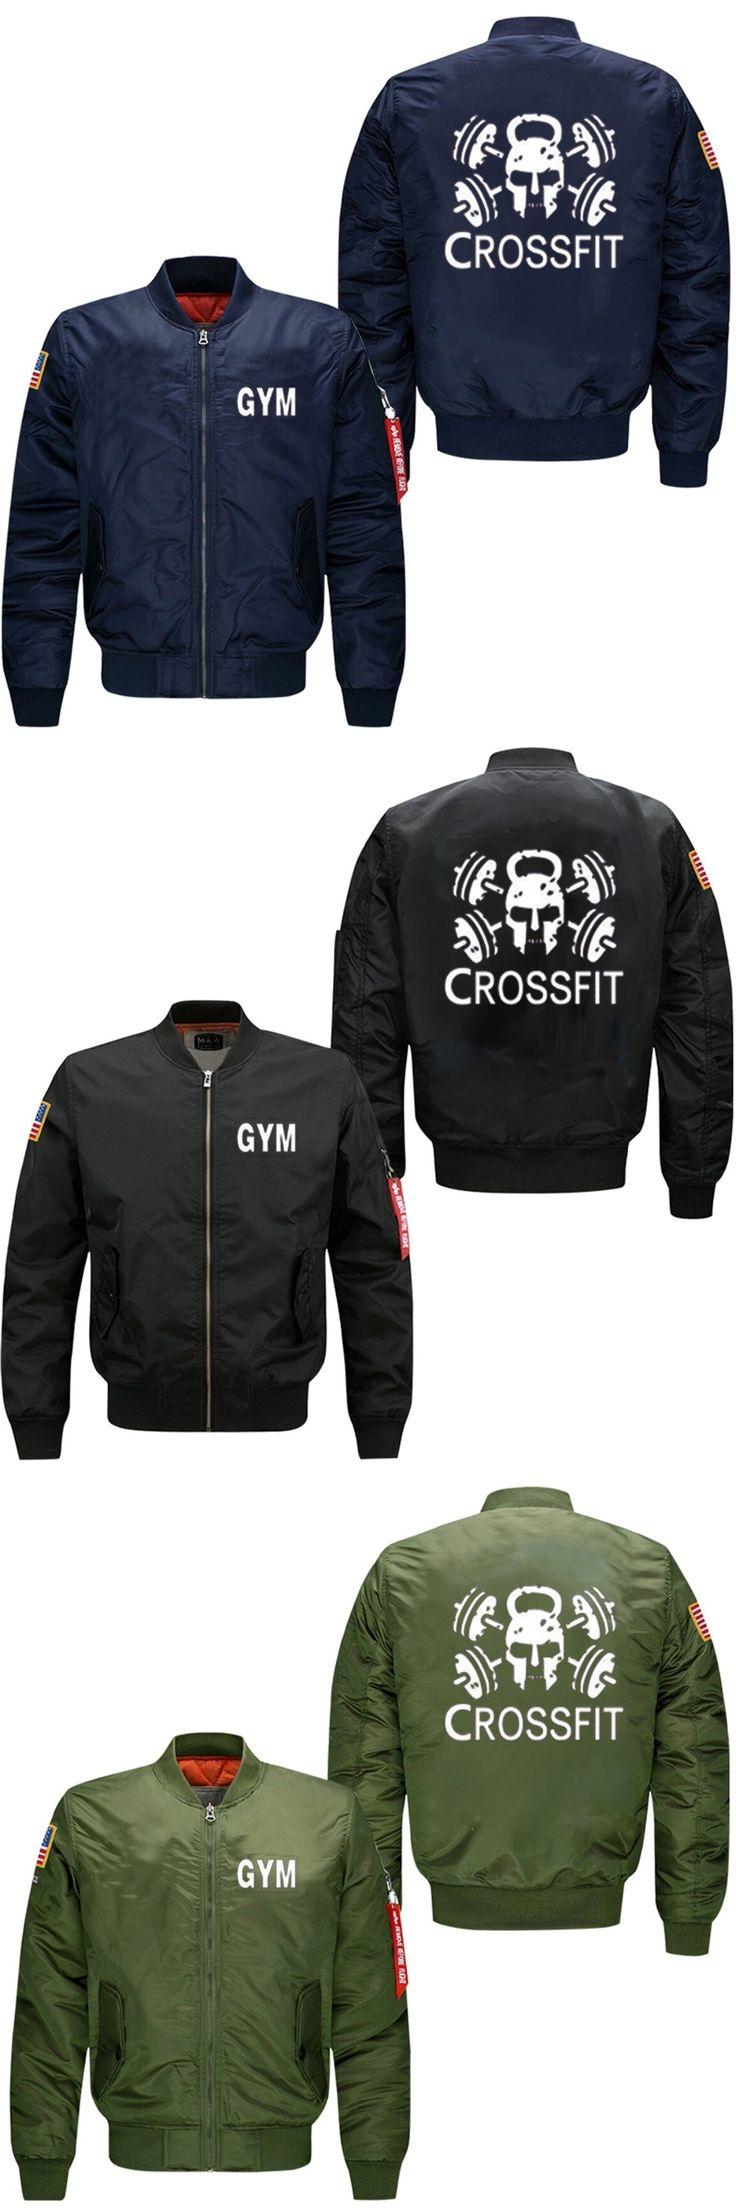 2017 new style  crossfit men's flight jacket collar code Air Force pilots  men's leisure baseball uniform, USA size